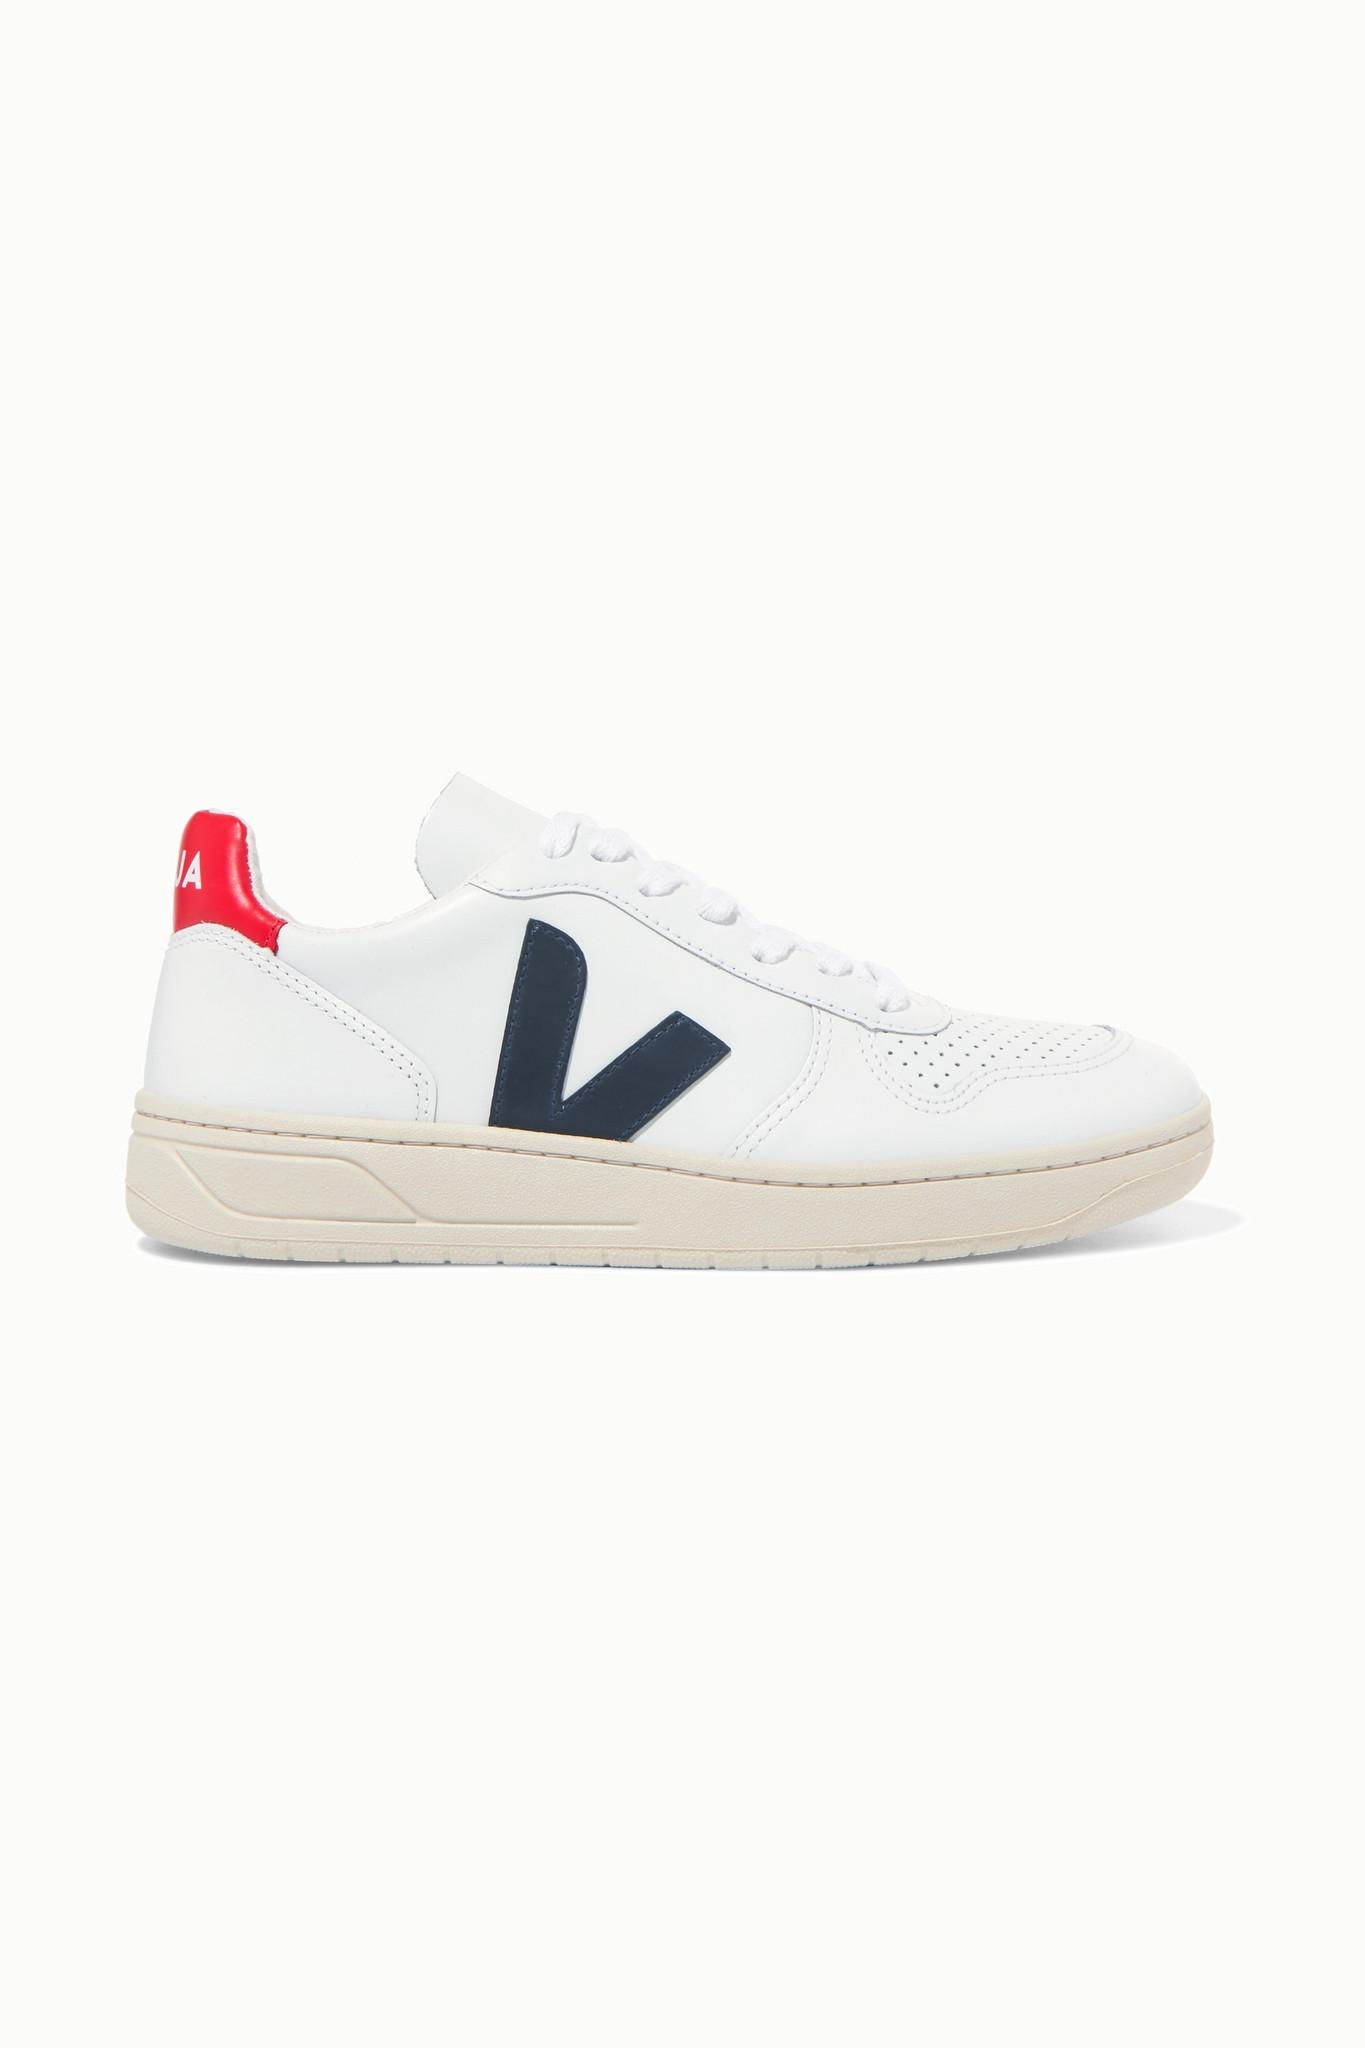 VEJA - + Net Sustain V-10 Leather Sneakers - White - IT41